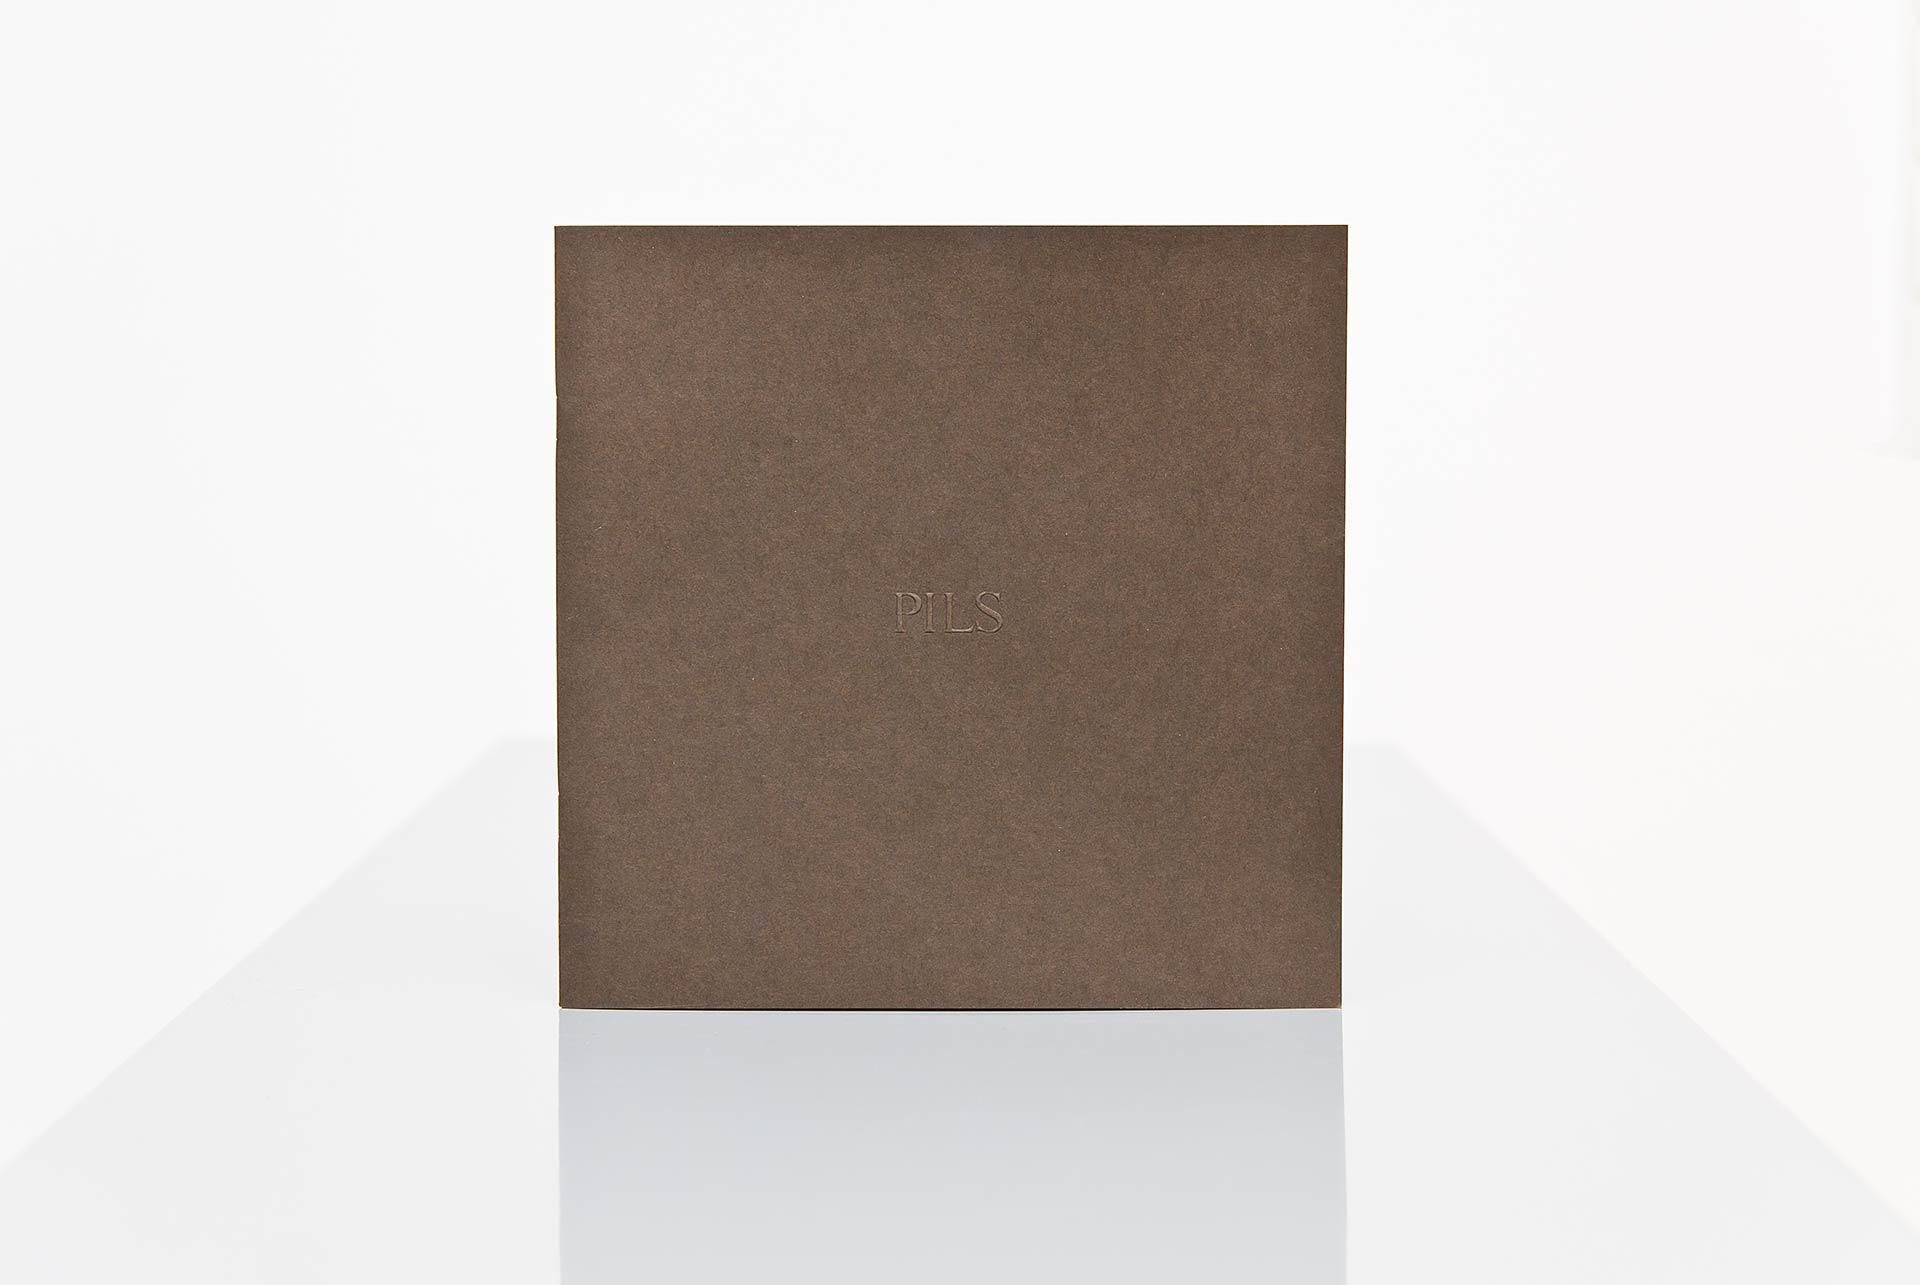 Pils Produktbroschüre